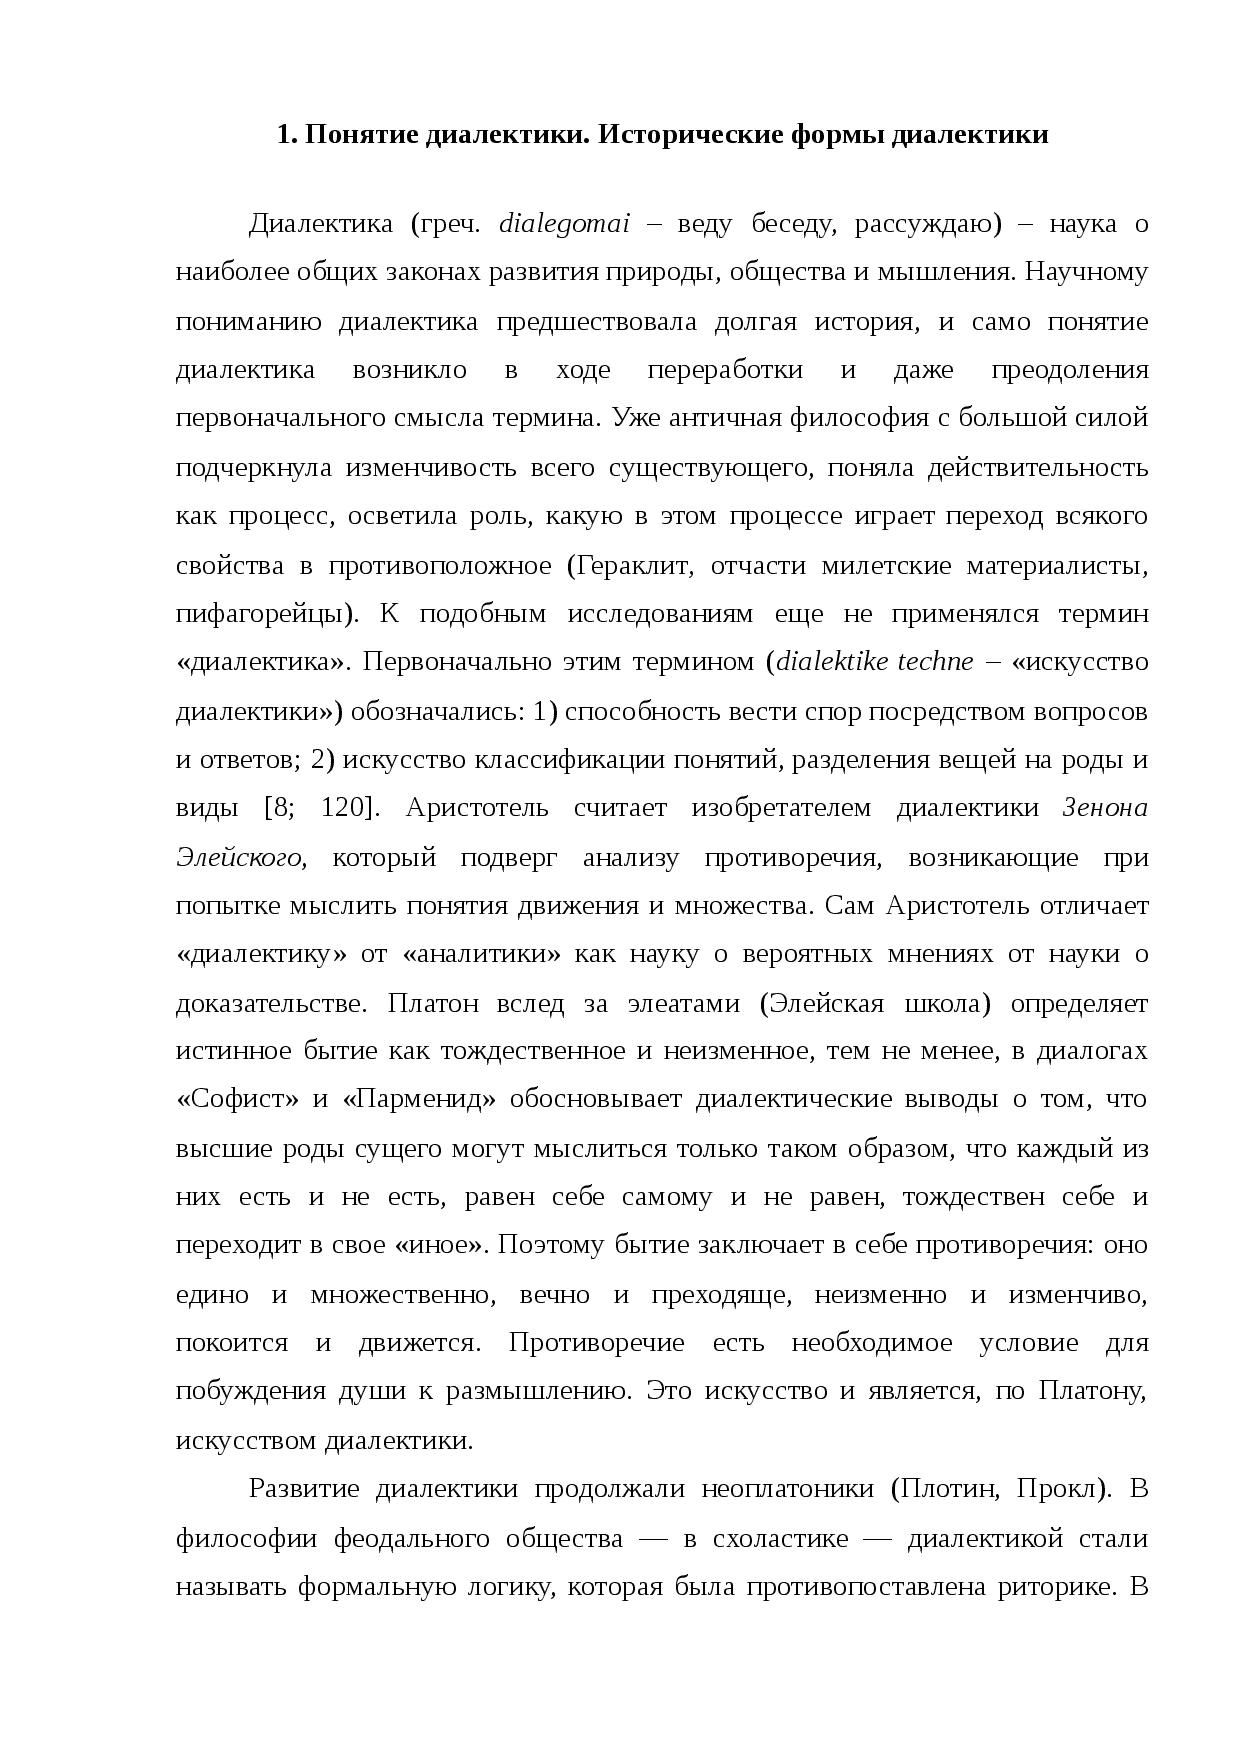 Психологика - диалектика